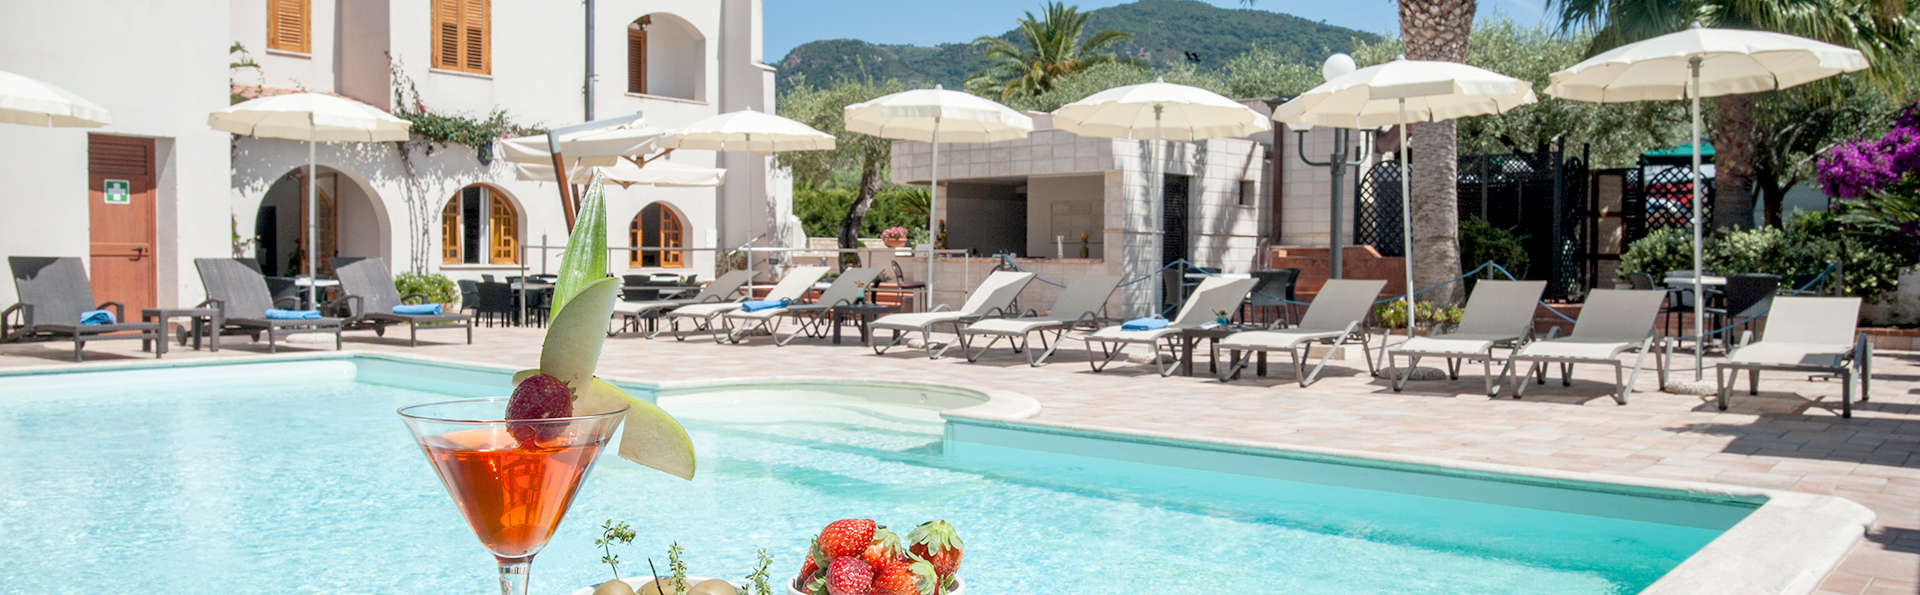 Hotel Baia del Capitano - Edit_Pool.jpg